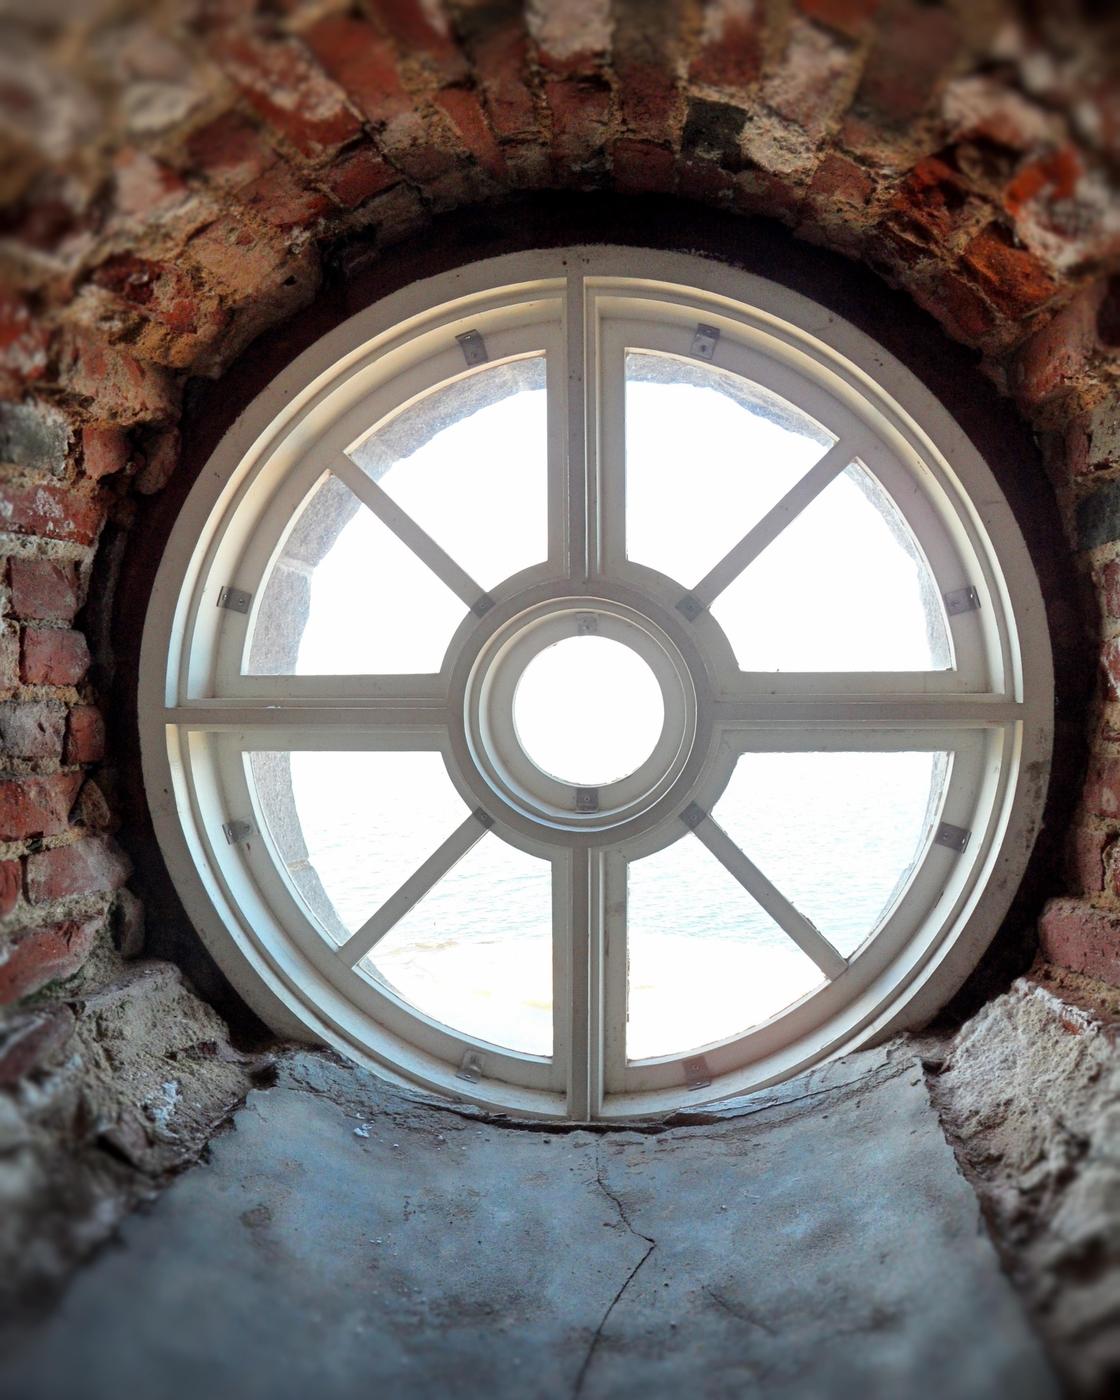 Ikkuna2.jpg